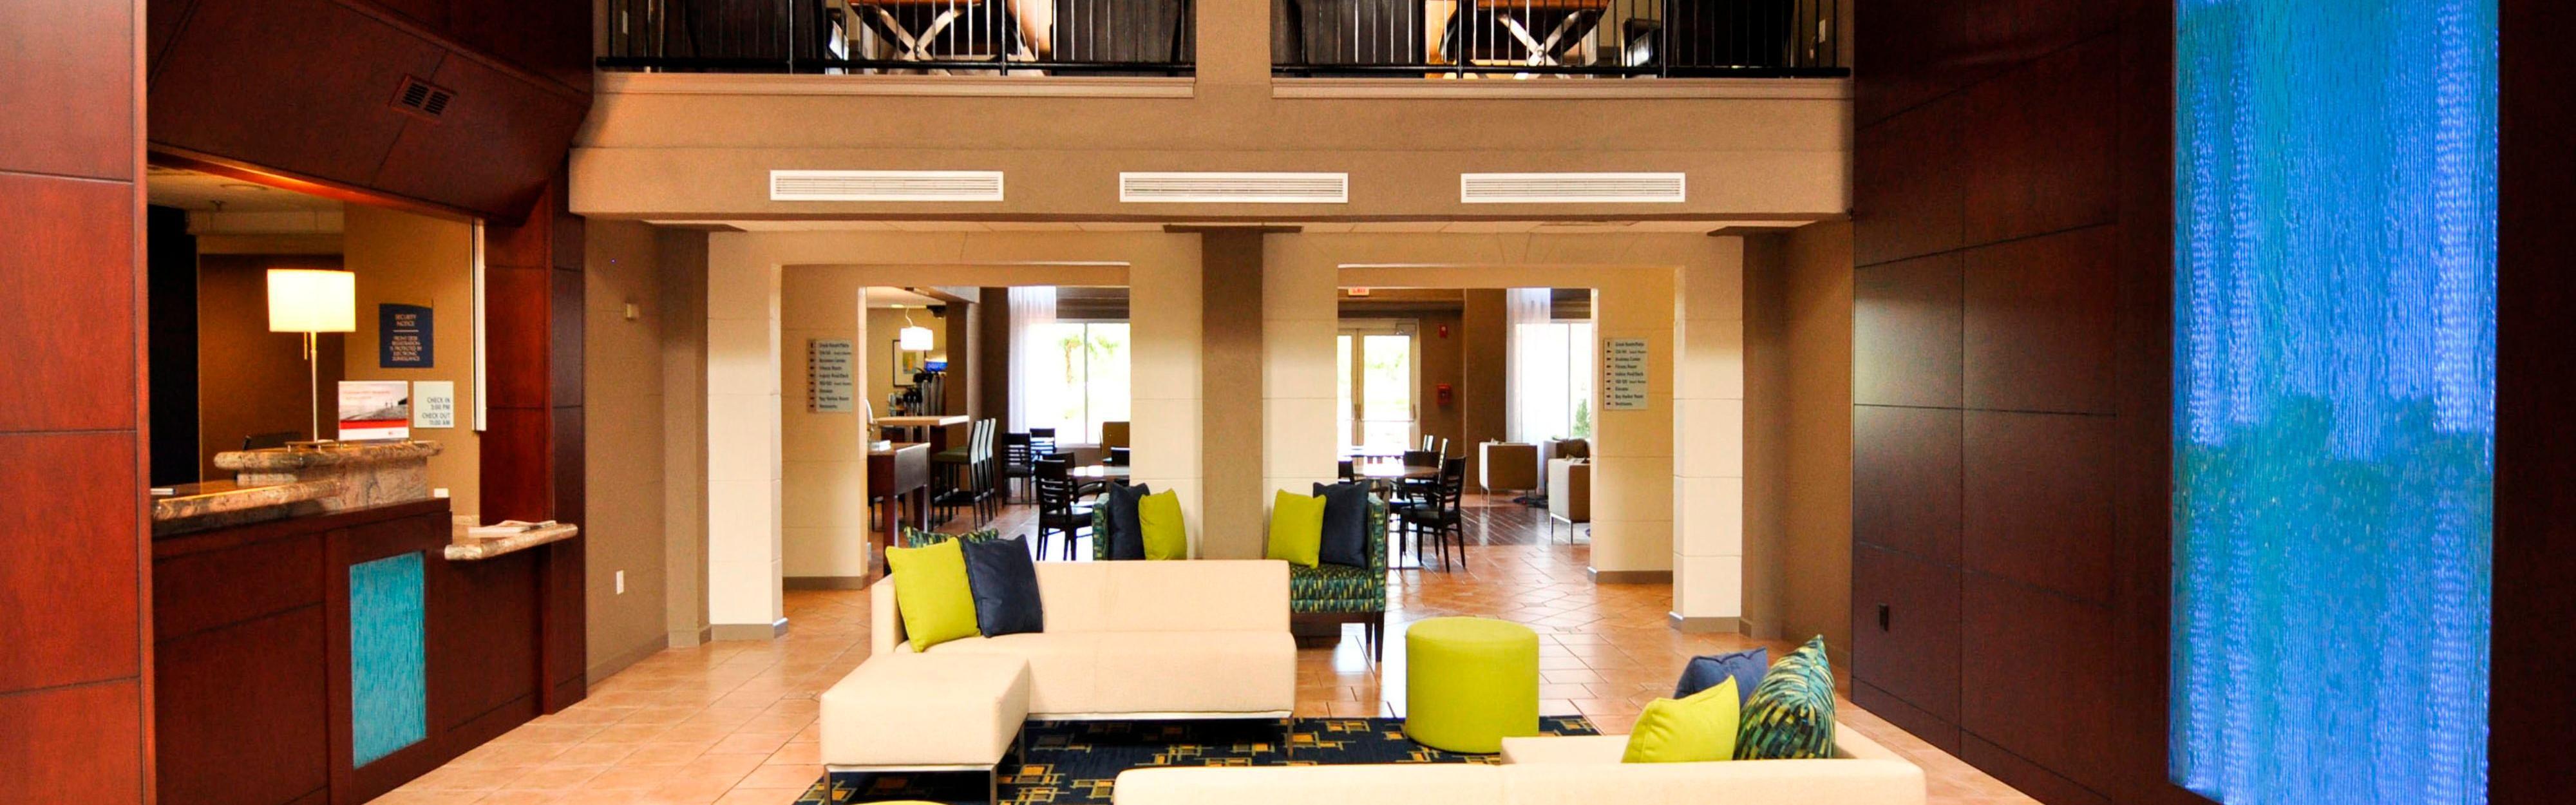 Holiday Inn Express & Suites Port Clinton-Catawba Island image 0